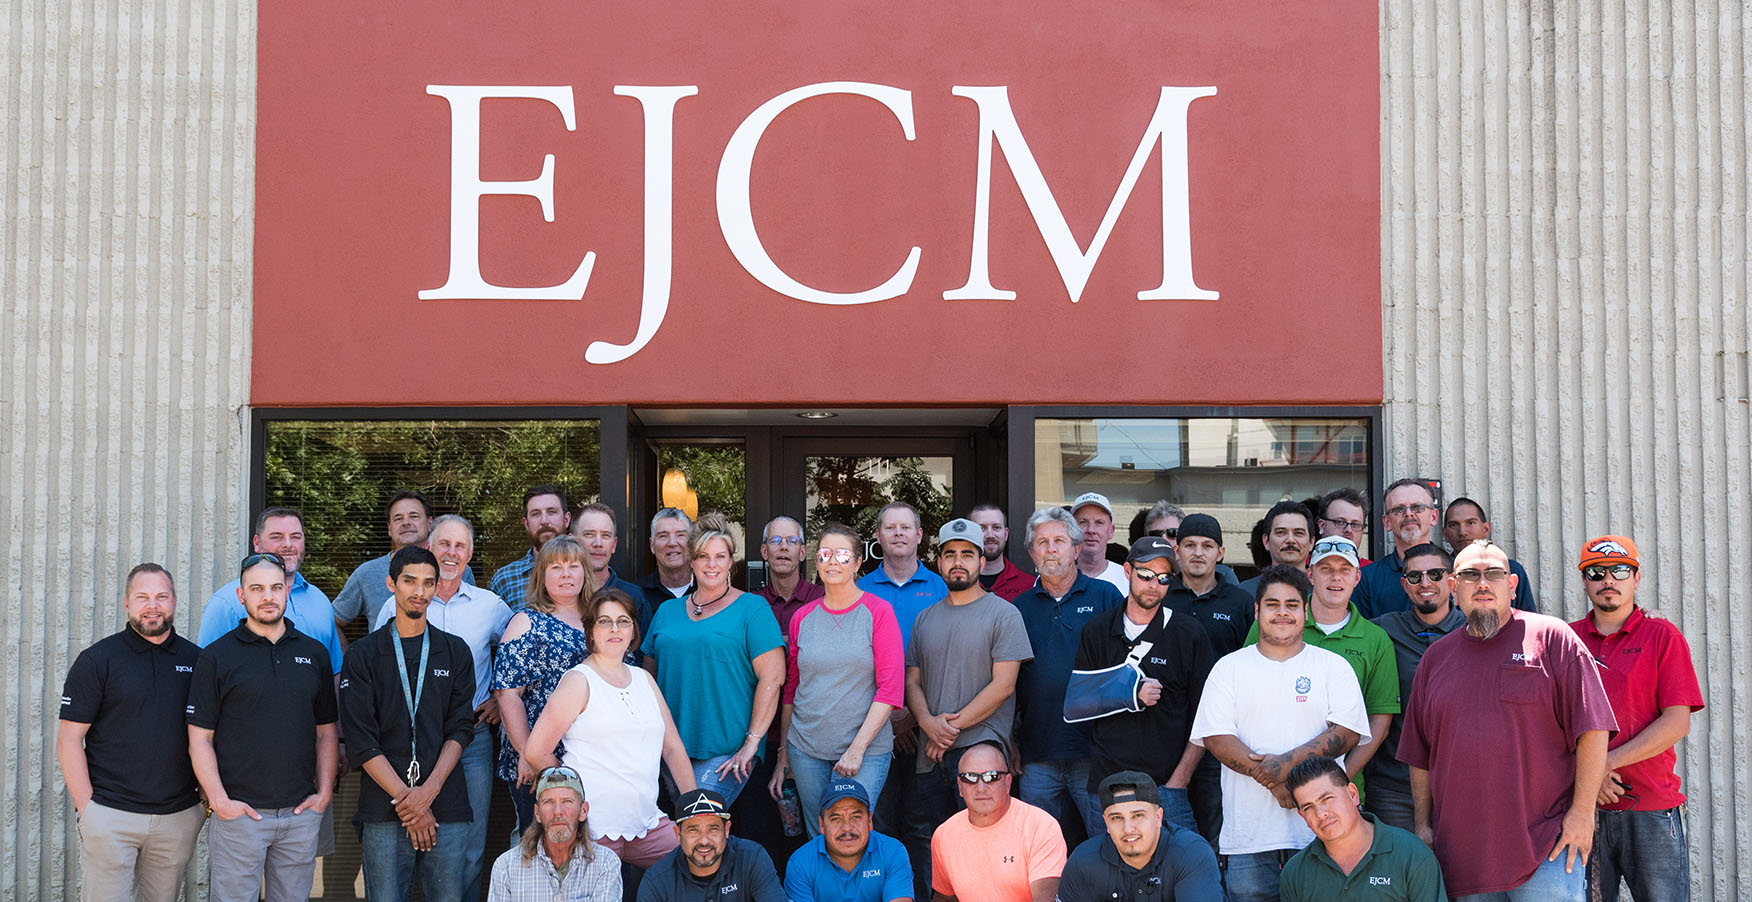 EJCM Team 2